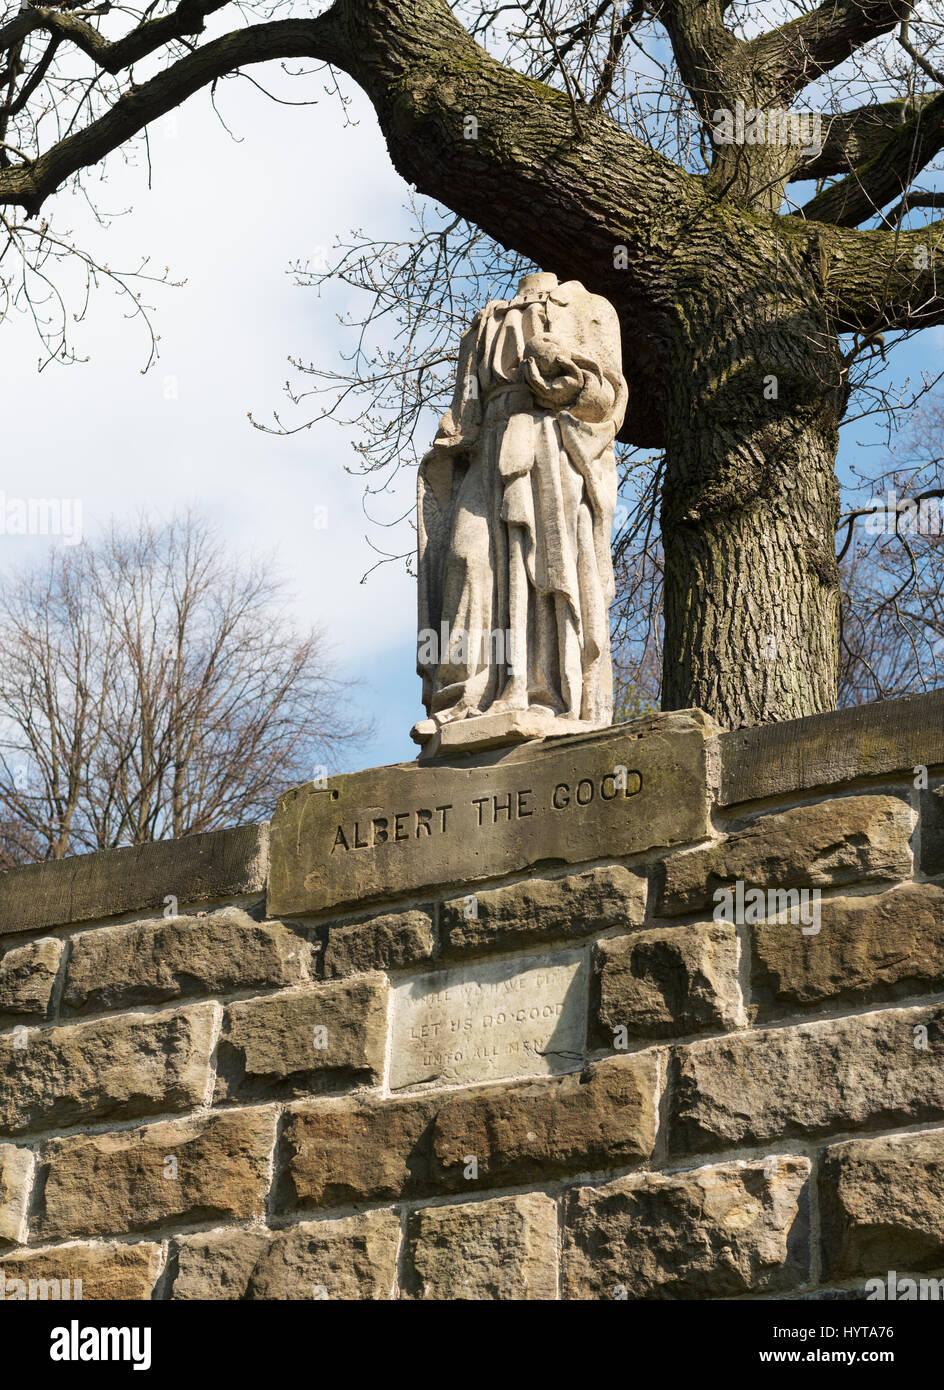 Statue Of Albert The Good In Wharton Park Durham City England Uk